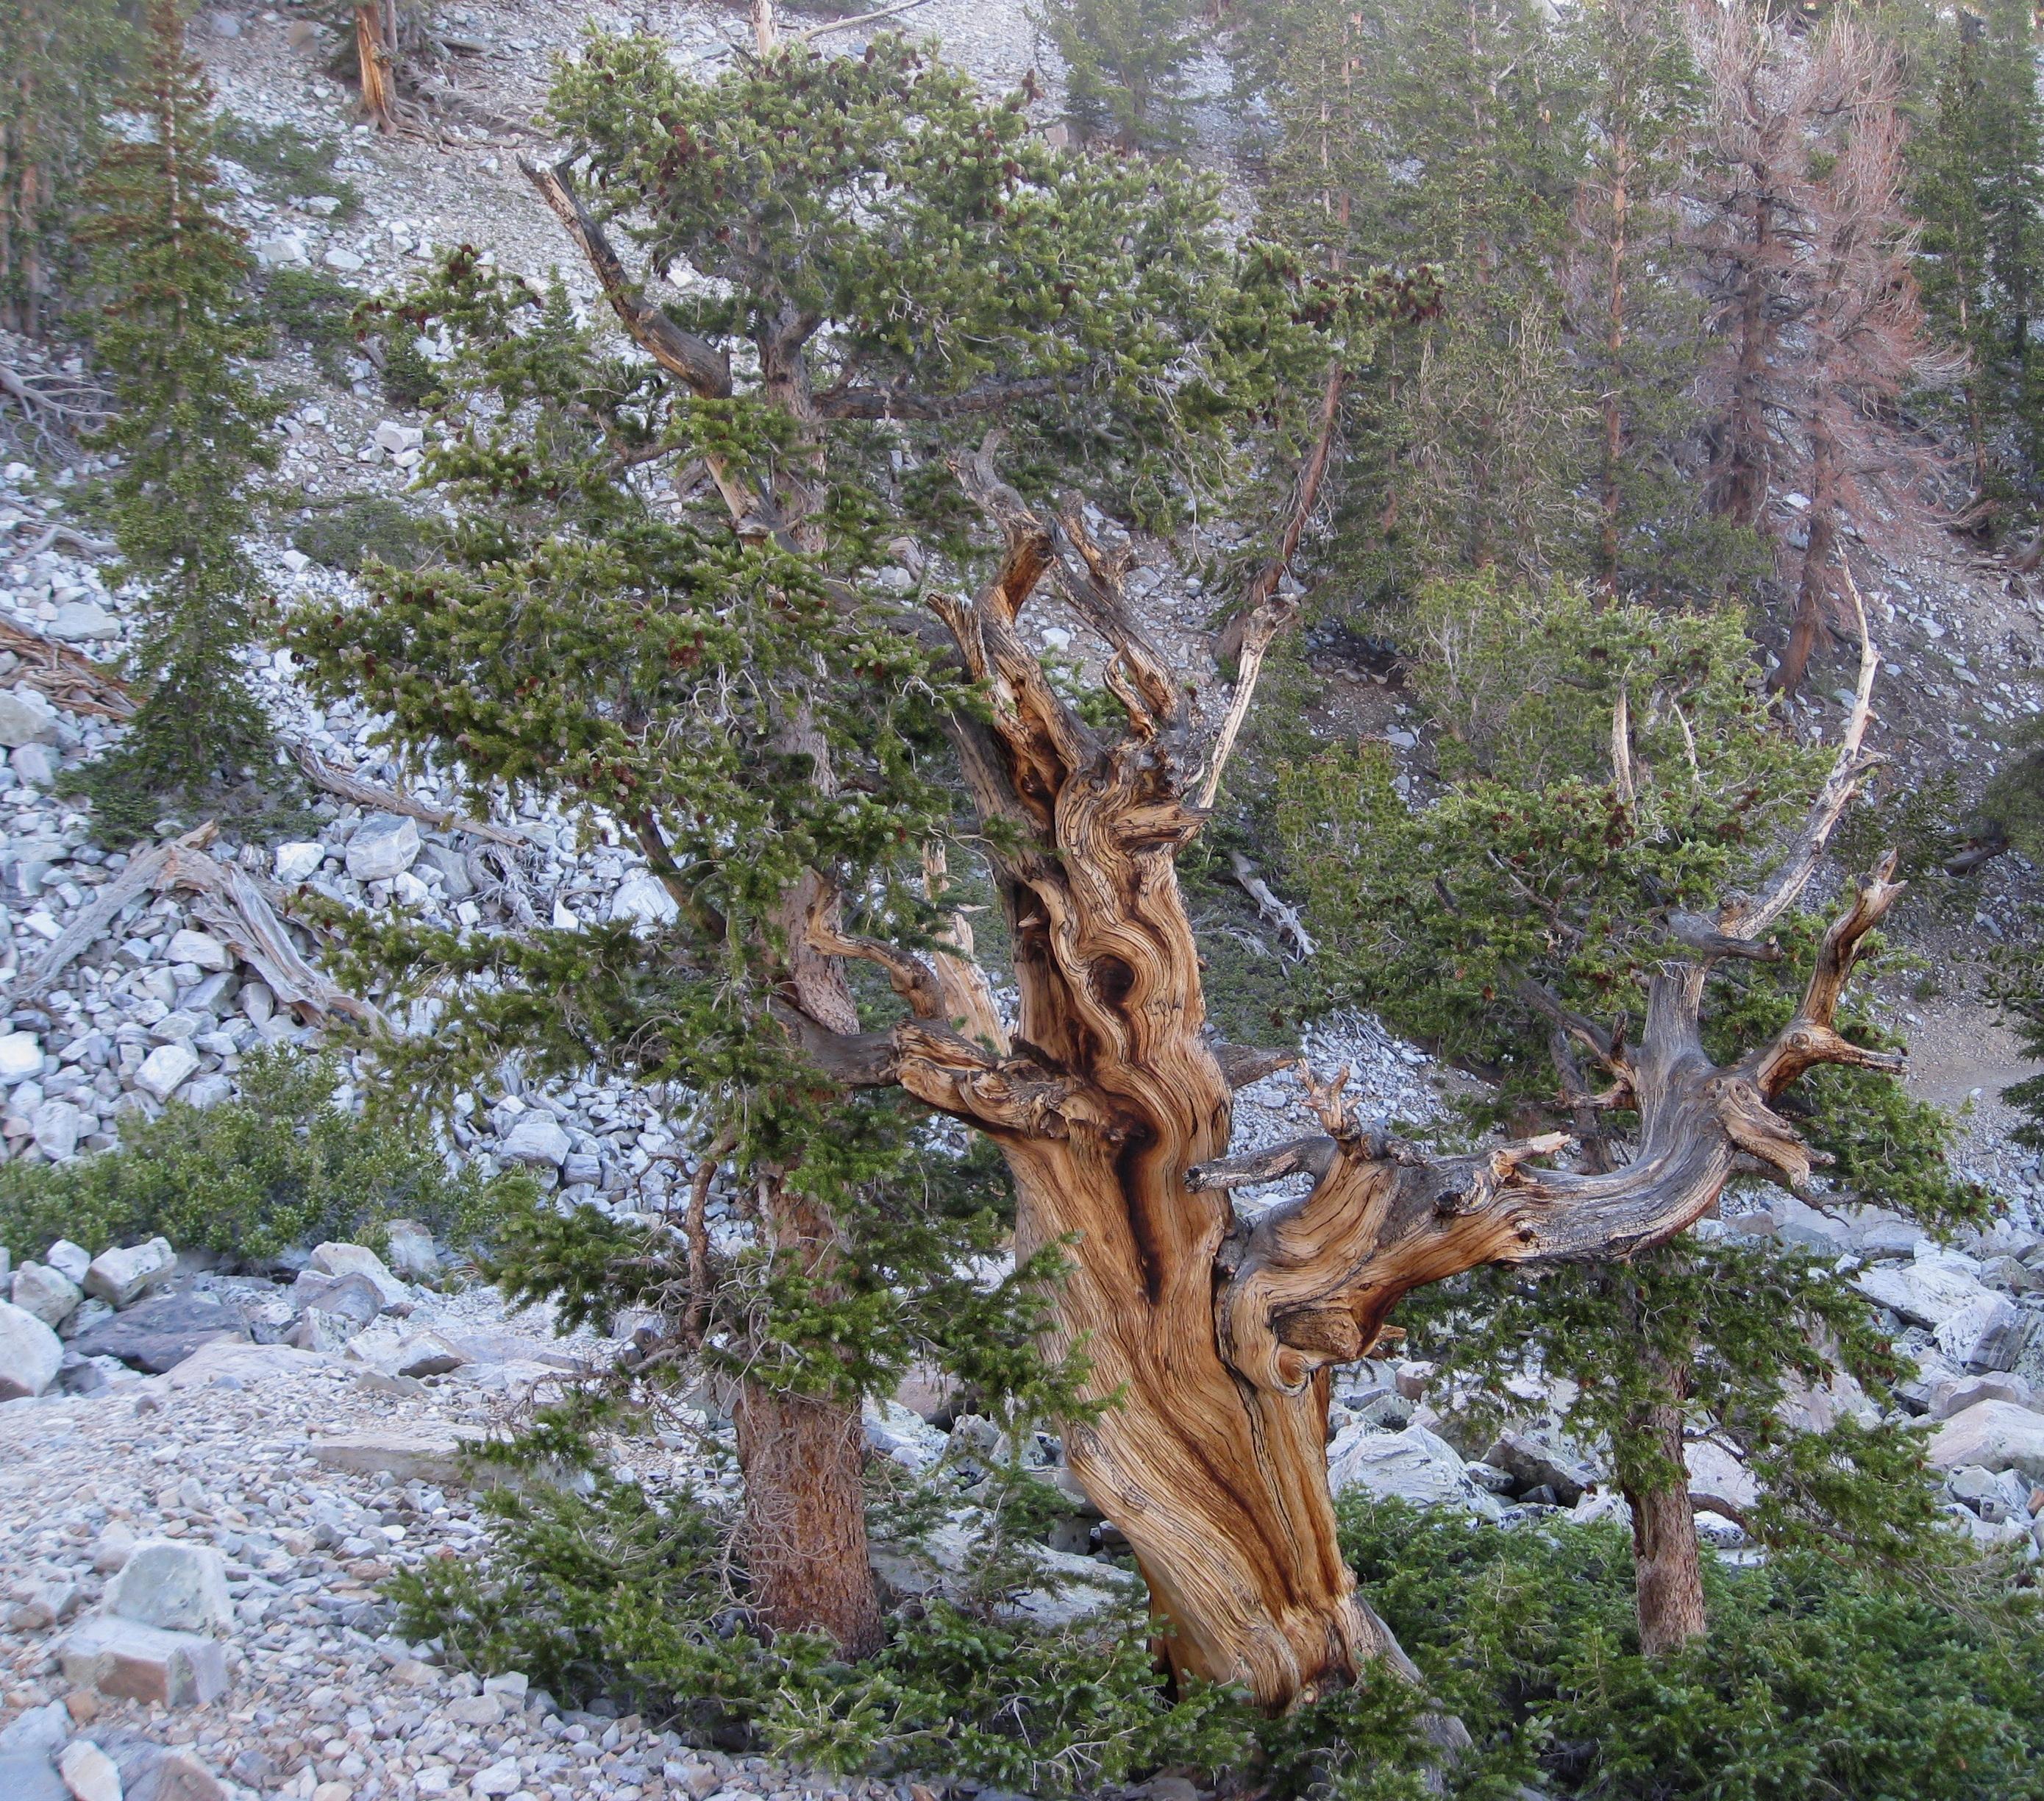 Pin laricio, bergerie de Grotelle(Corse)